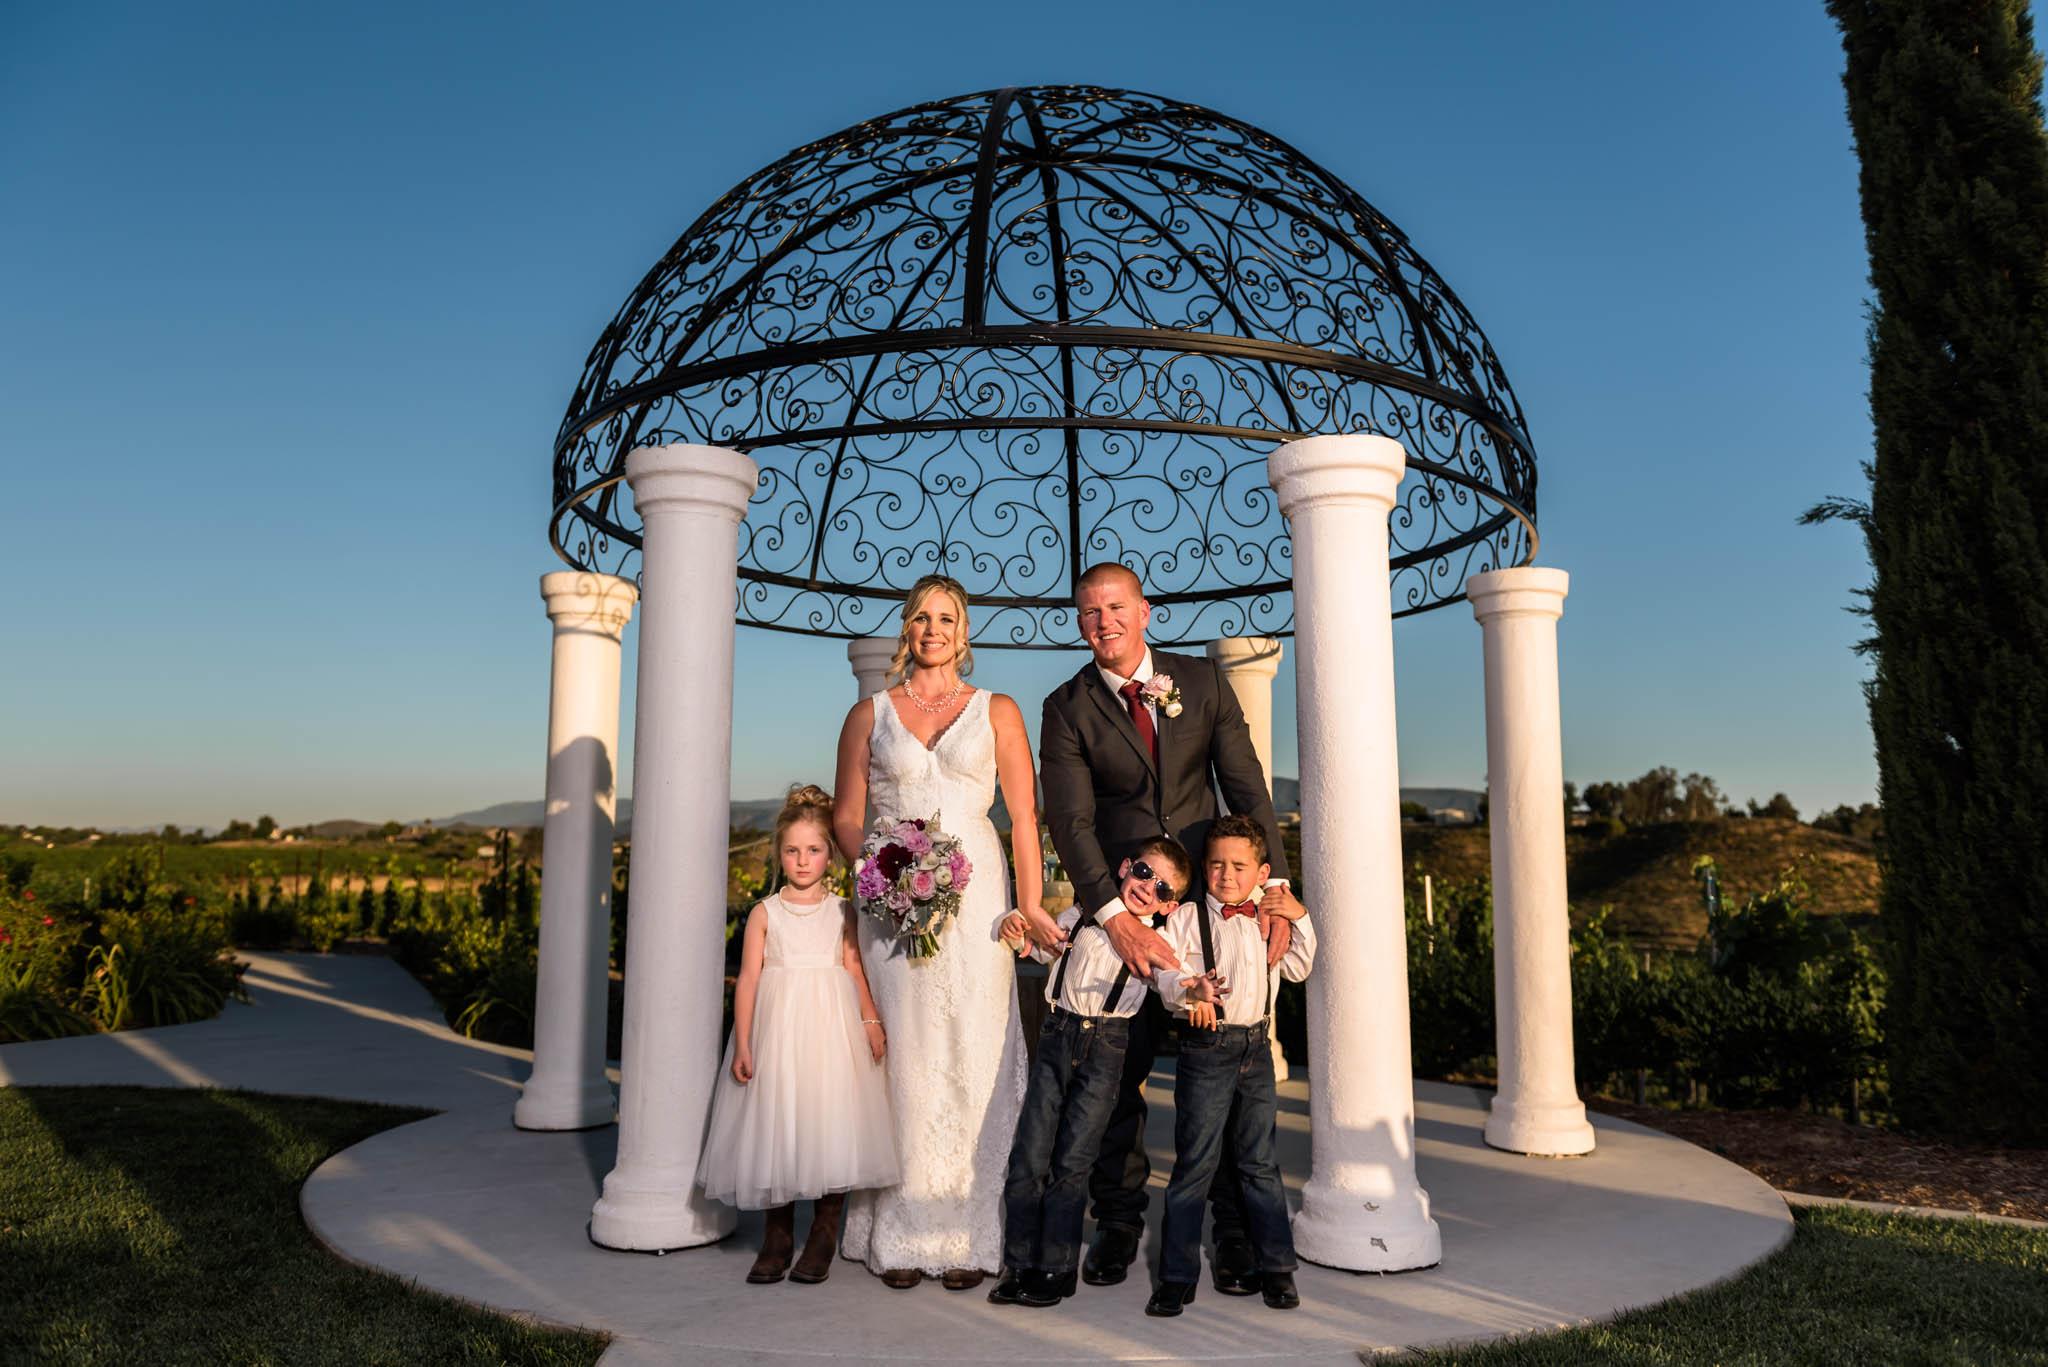 Avensole-Winery-Temecula-Wedding-Josh-and-Olivia-3730.JPG